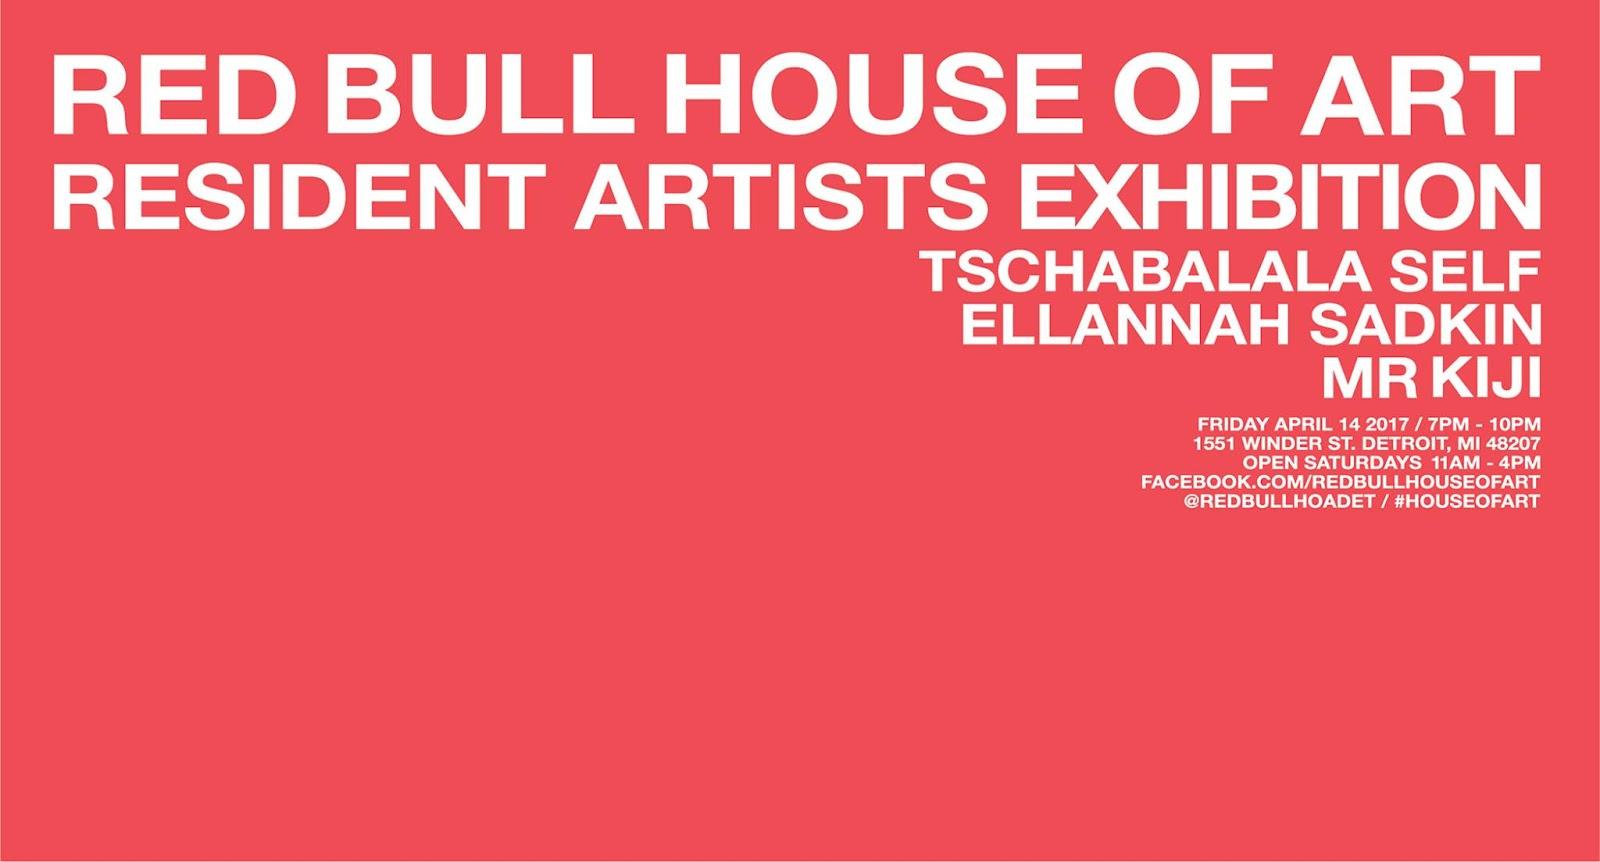 House of art gallery facebook